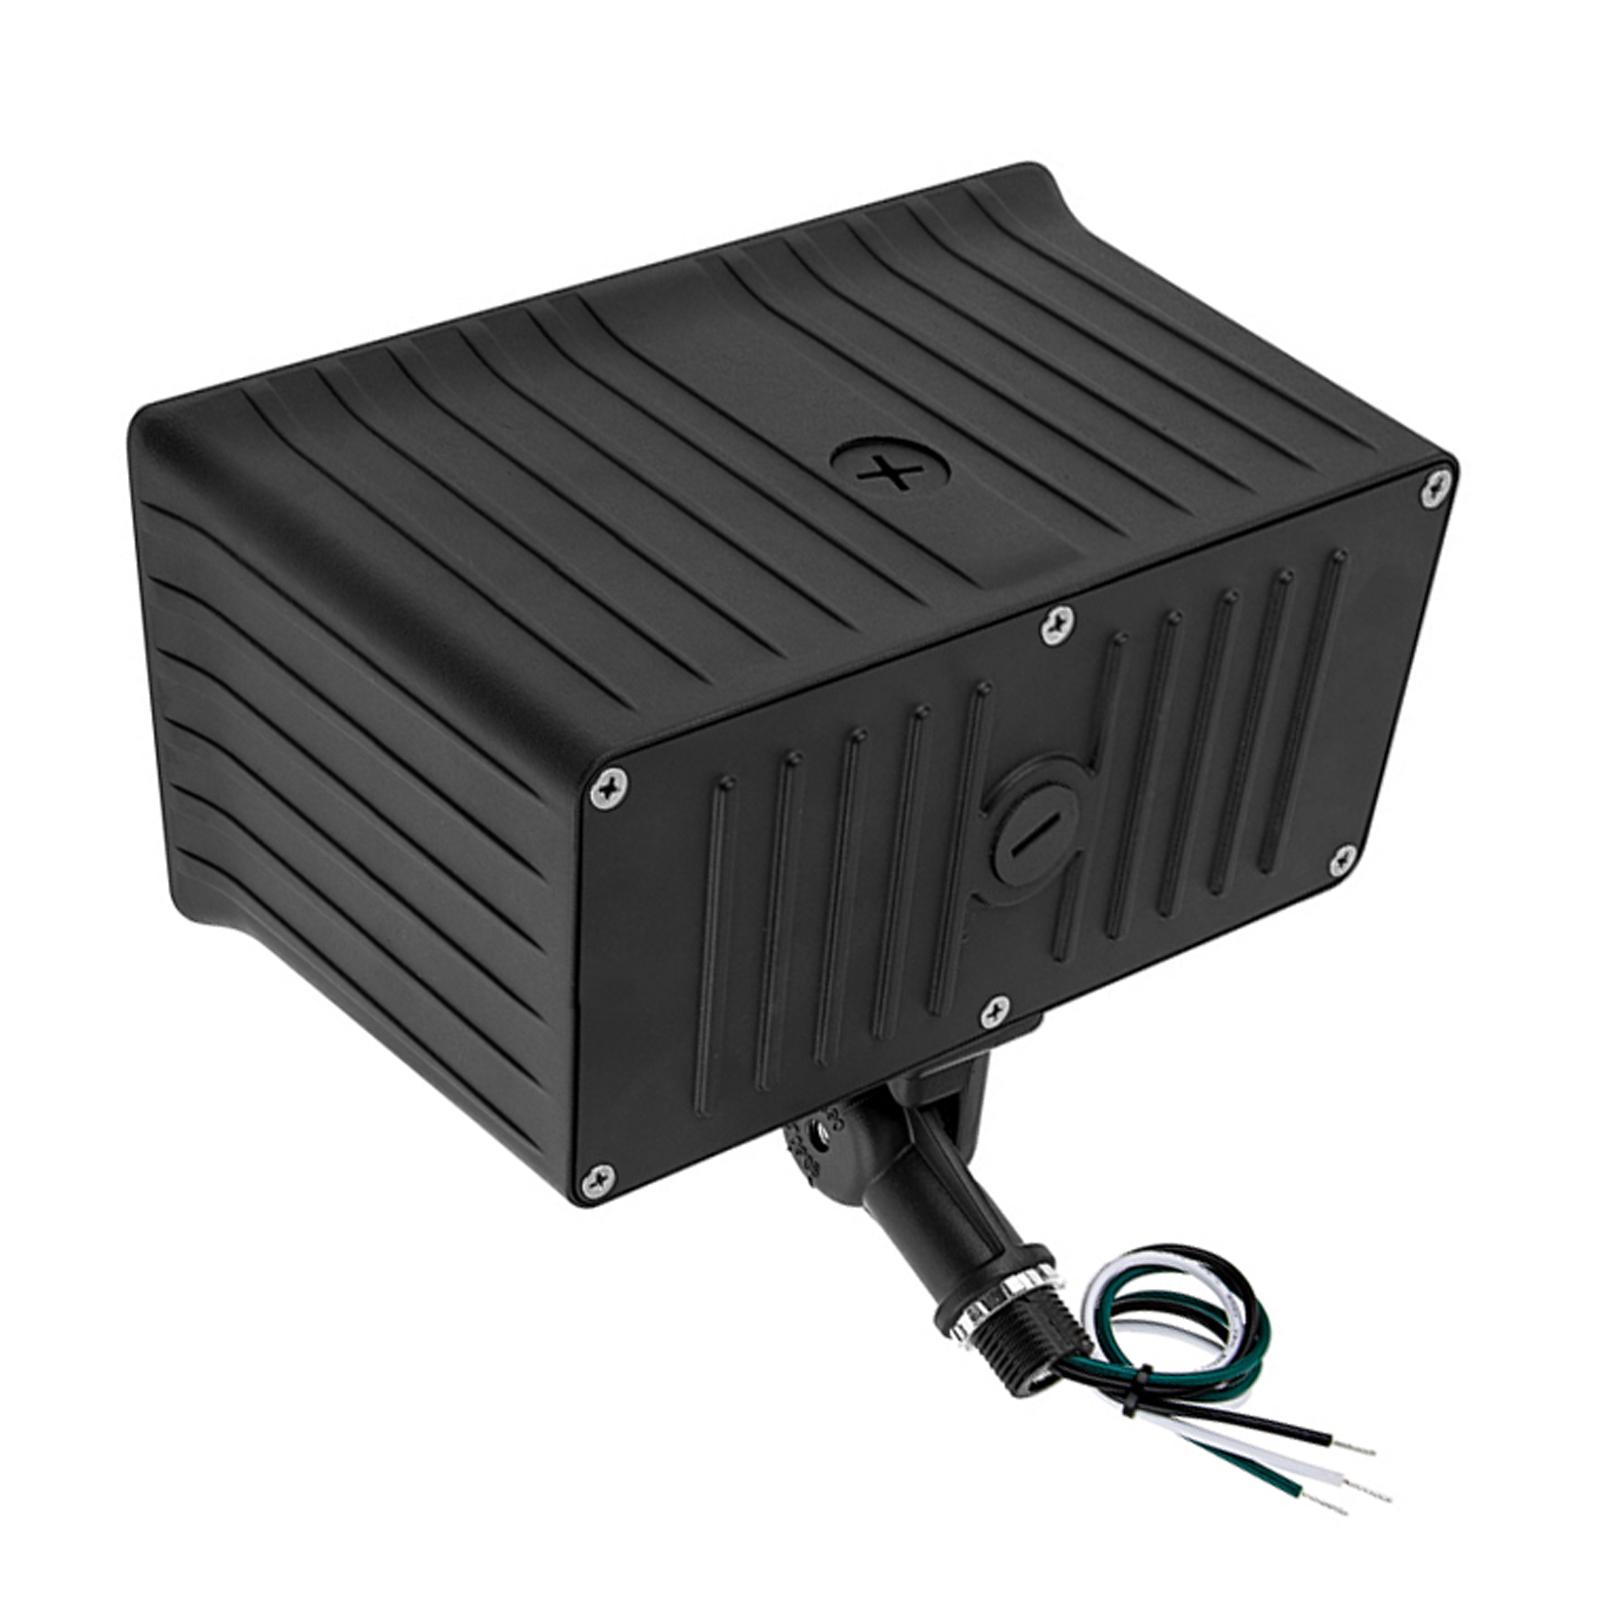 5400lm Led Flood Light Outdoor Ip65 Upgrade Flood Lighting